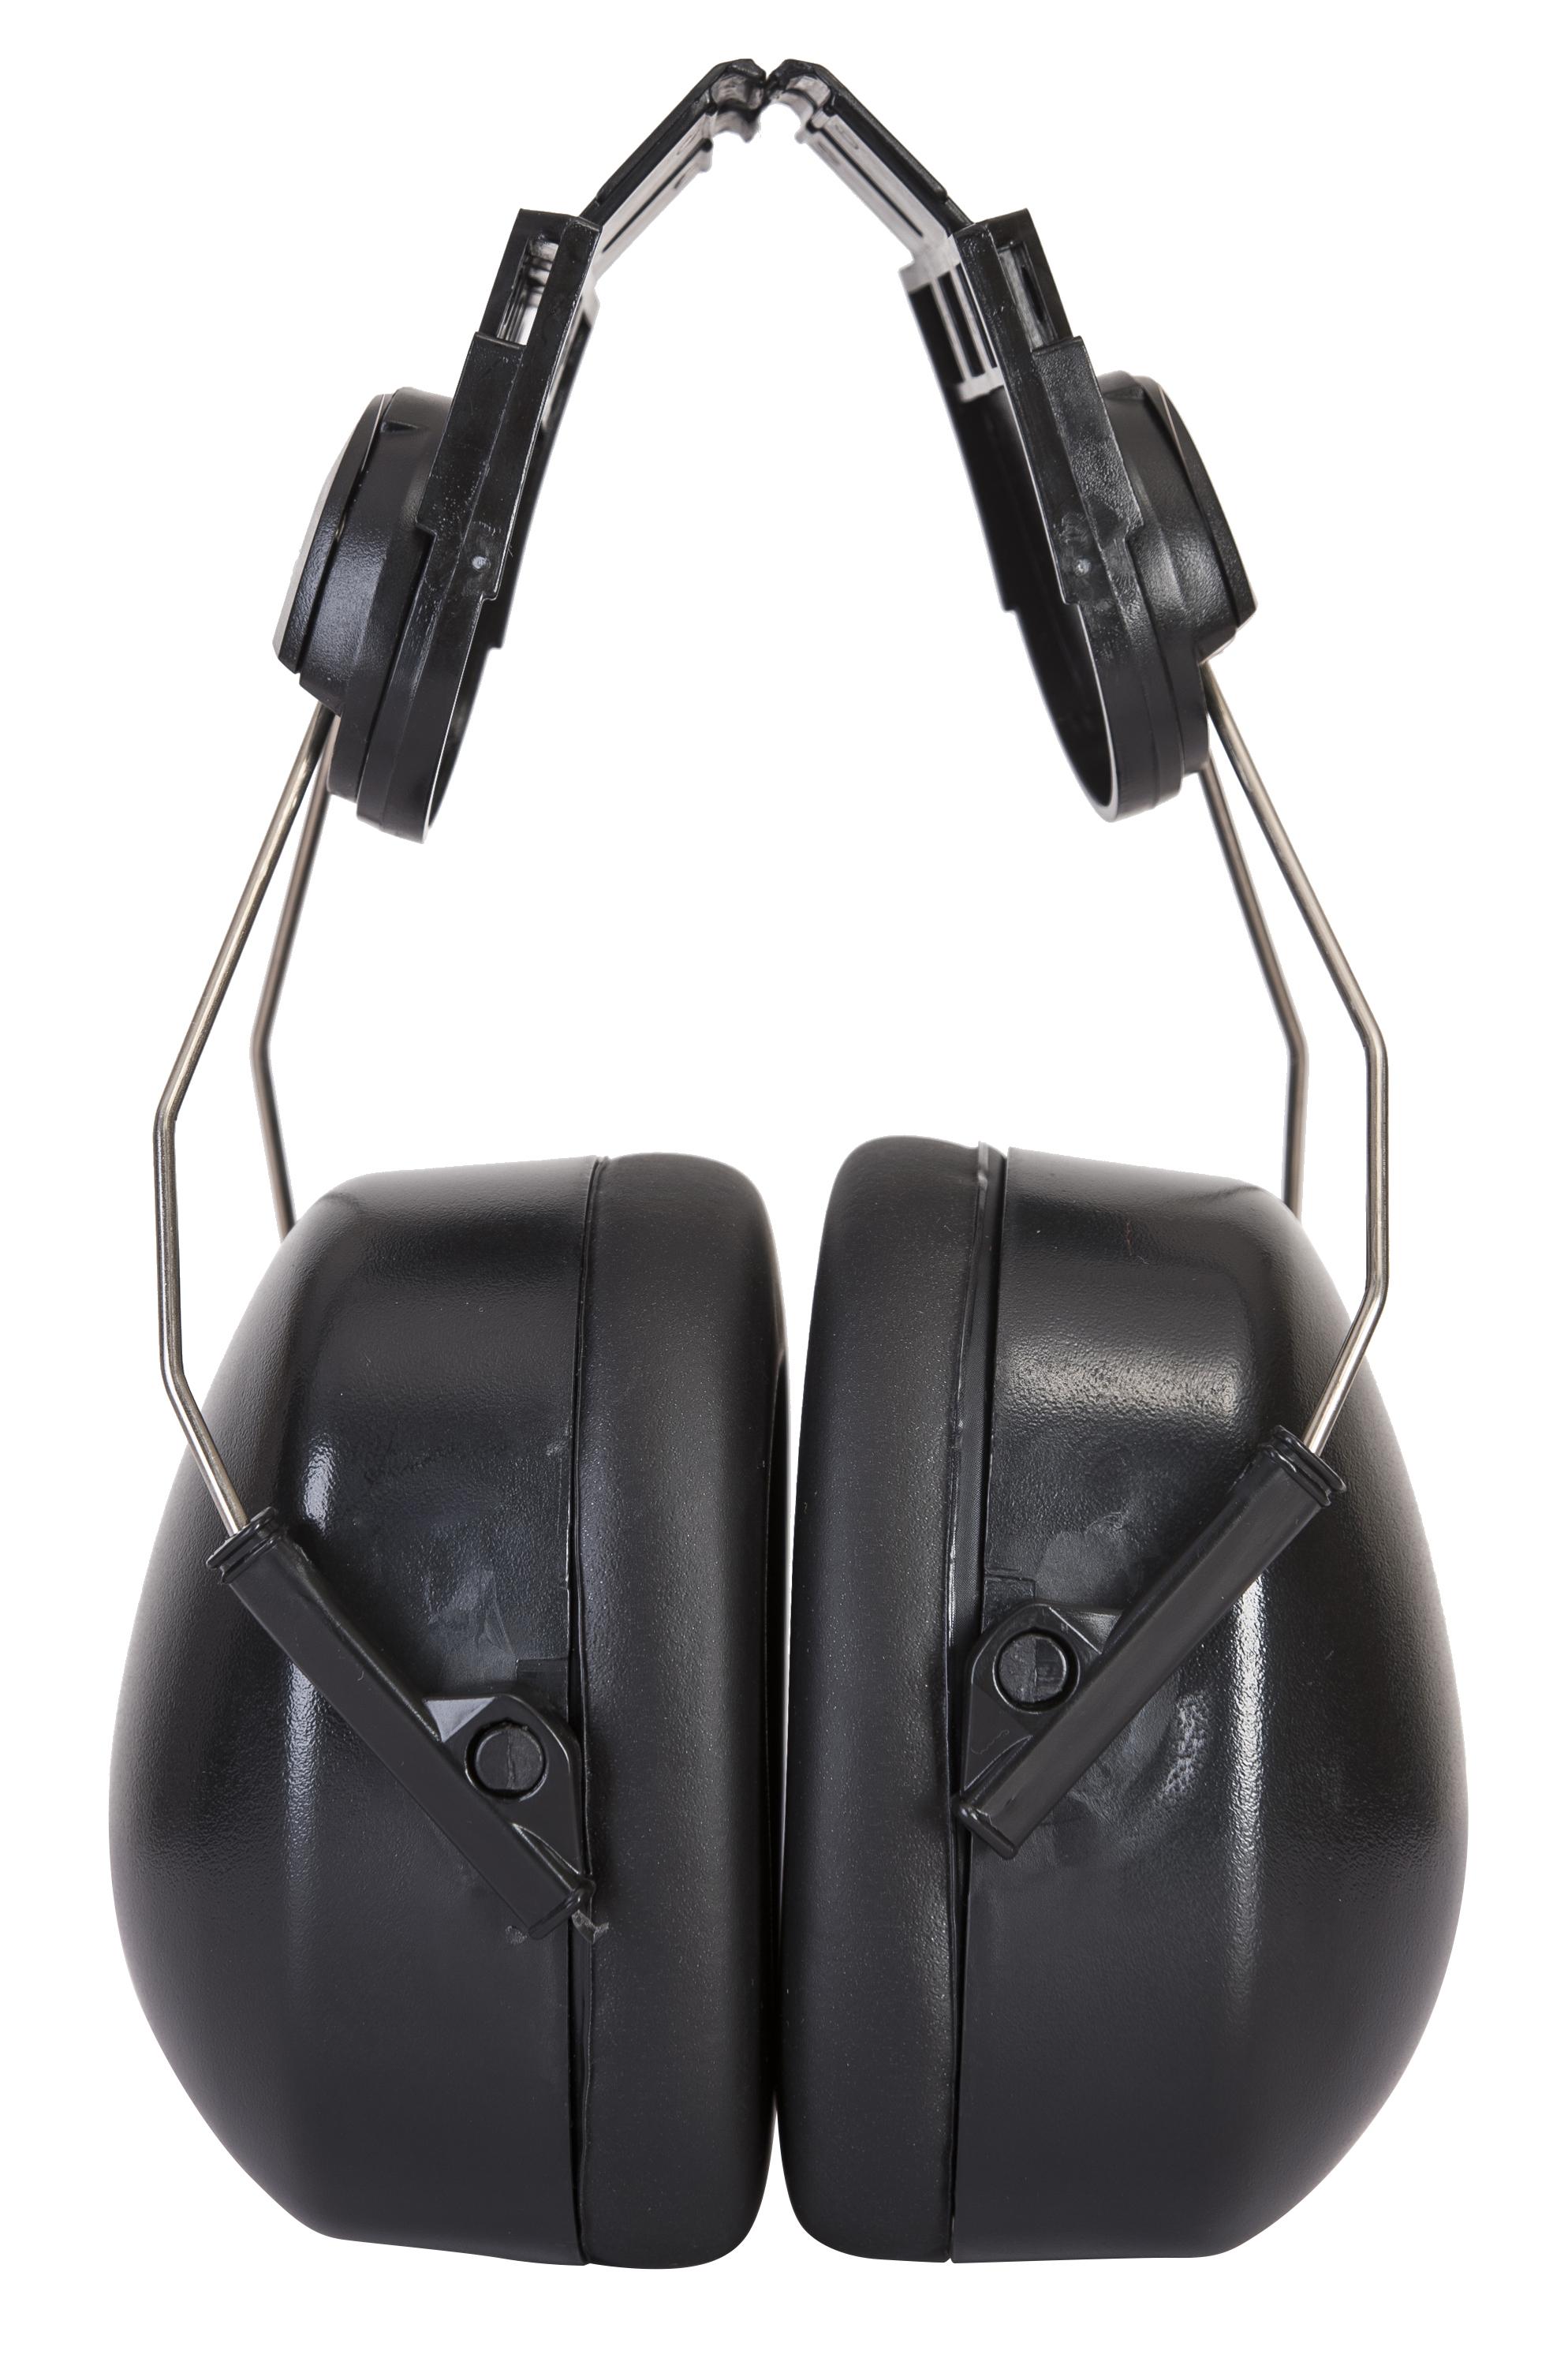 PW47 Endurance Clip-On Ear Protector